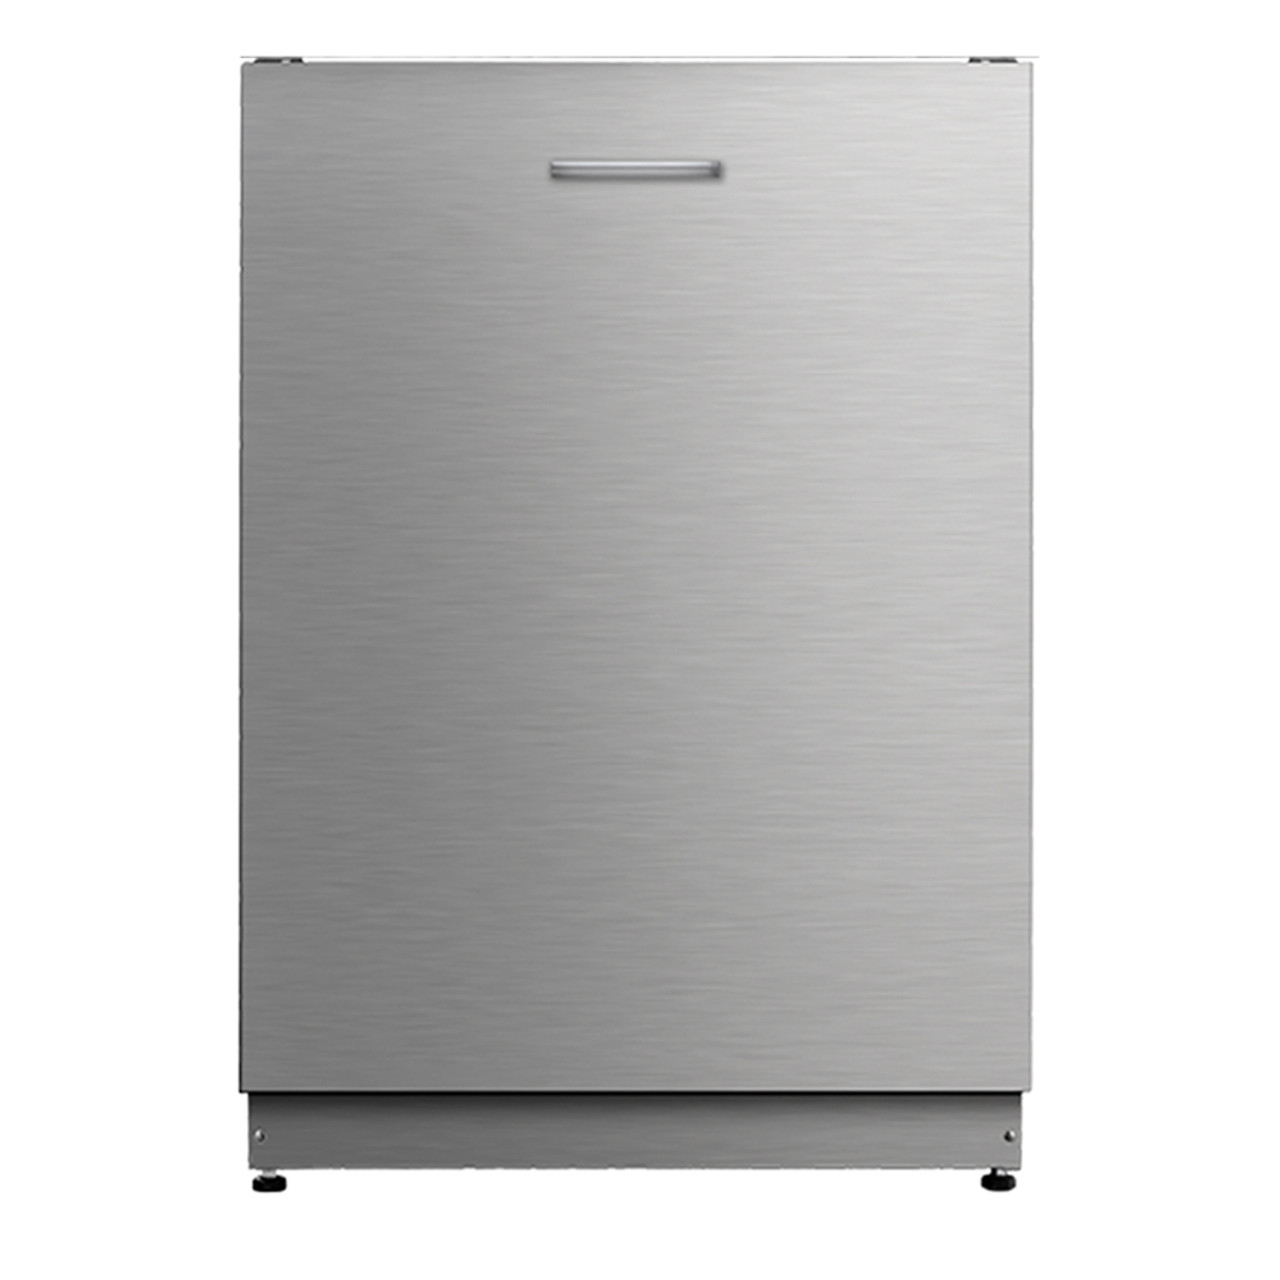 600mm Integrated Dishwasher